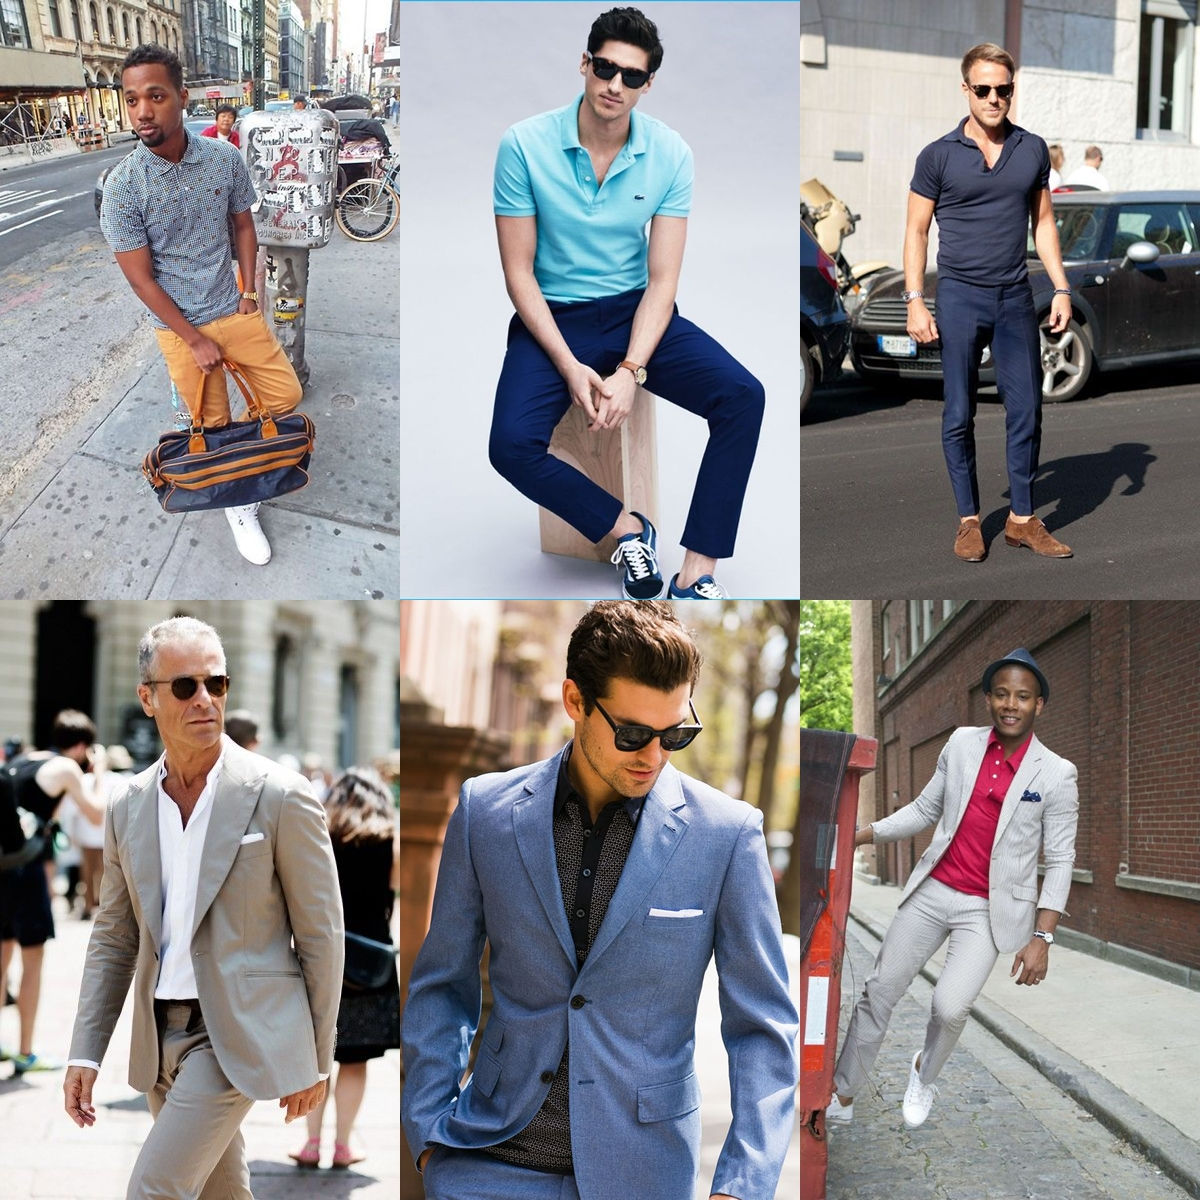 como-usar-camisa-polo-camisa-polo-masculina-alex-cursino-dicas-de-moda-como-ser-estiloso-estilo-masculino-moda-sem-censura-blogger-digital-influencer-4